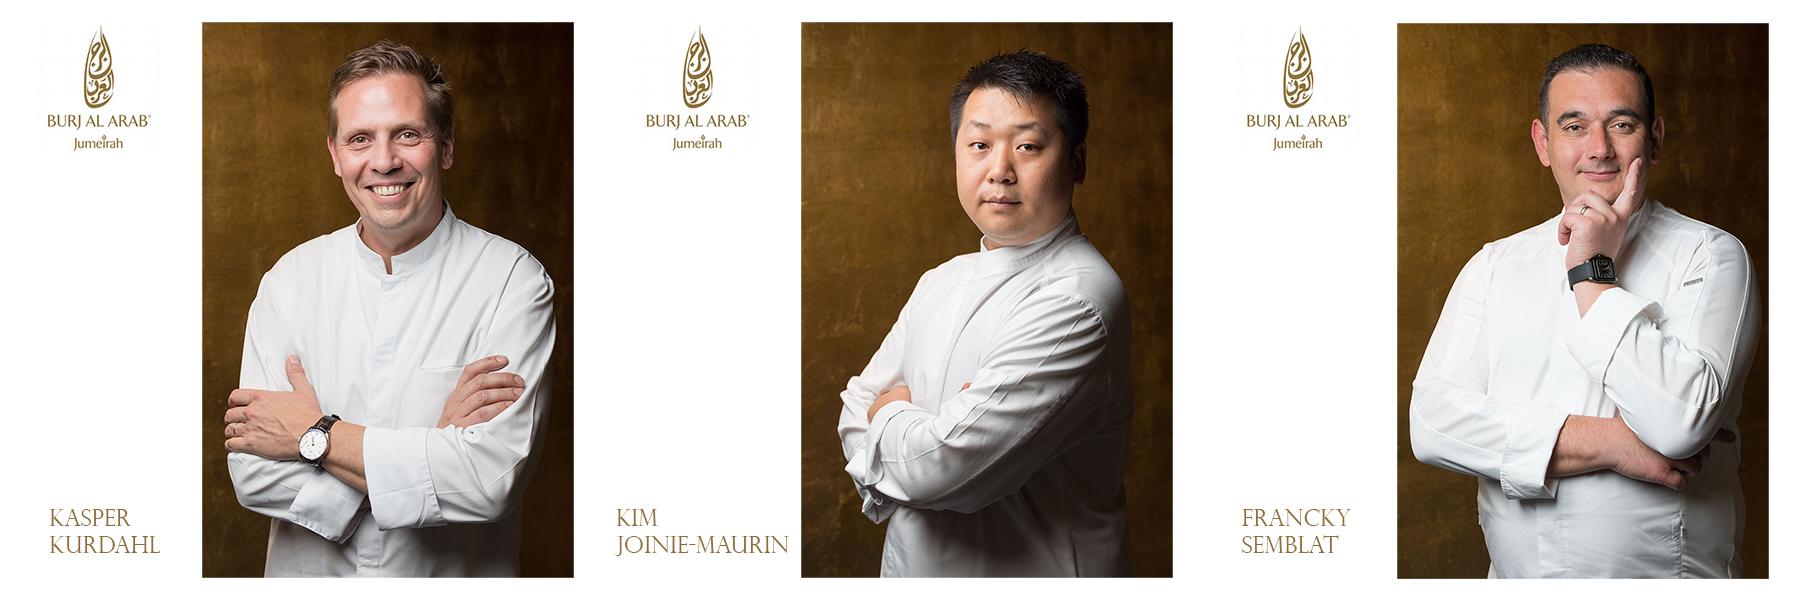 Commercial portraits of Jumeirah Burj Al Arab's celebrity chefs by Loesje Kessels Fashion Photographer Dubai